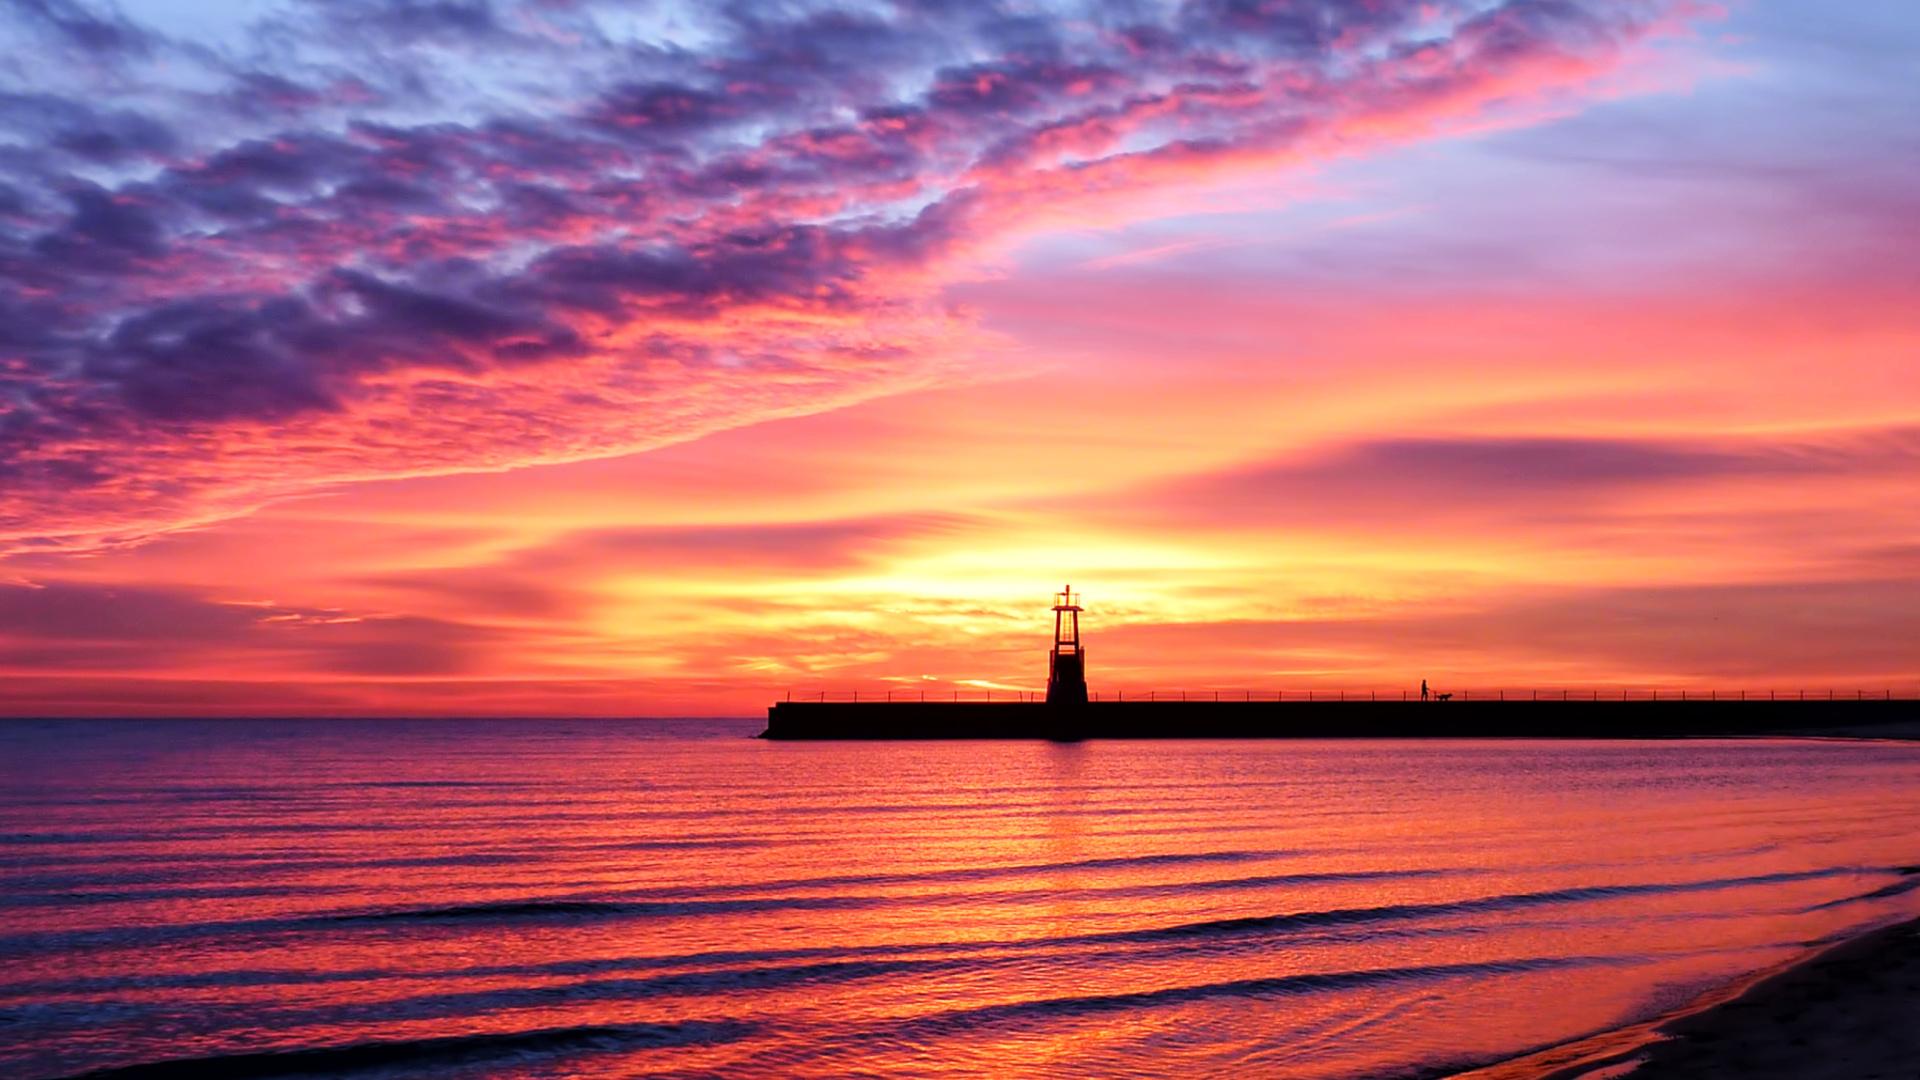 sunset screensavers screensaver lighthouse wallpapers wallpapersafari code